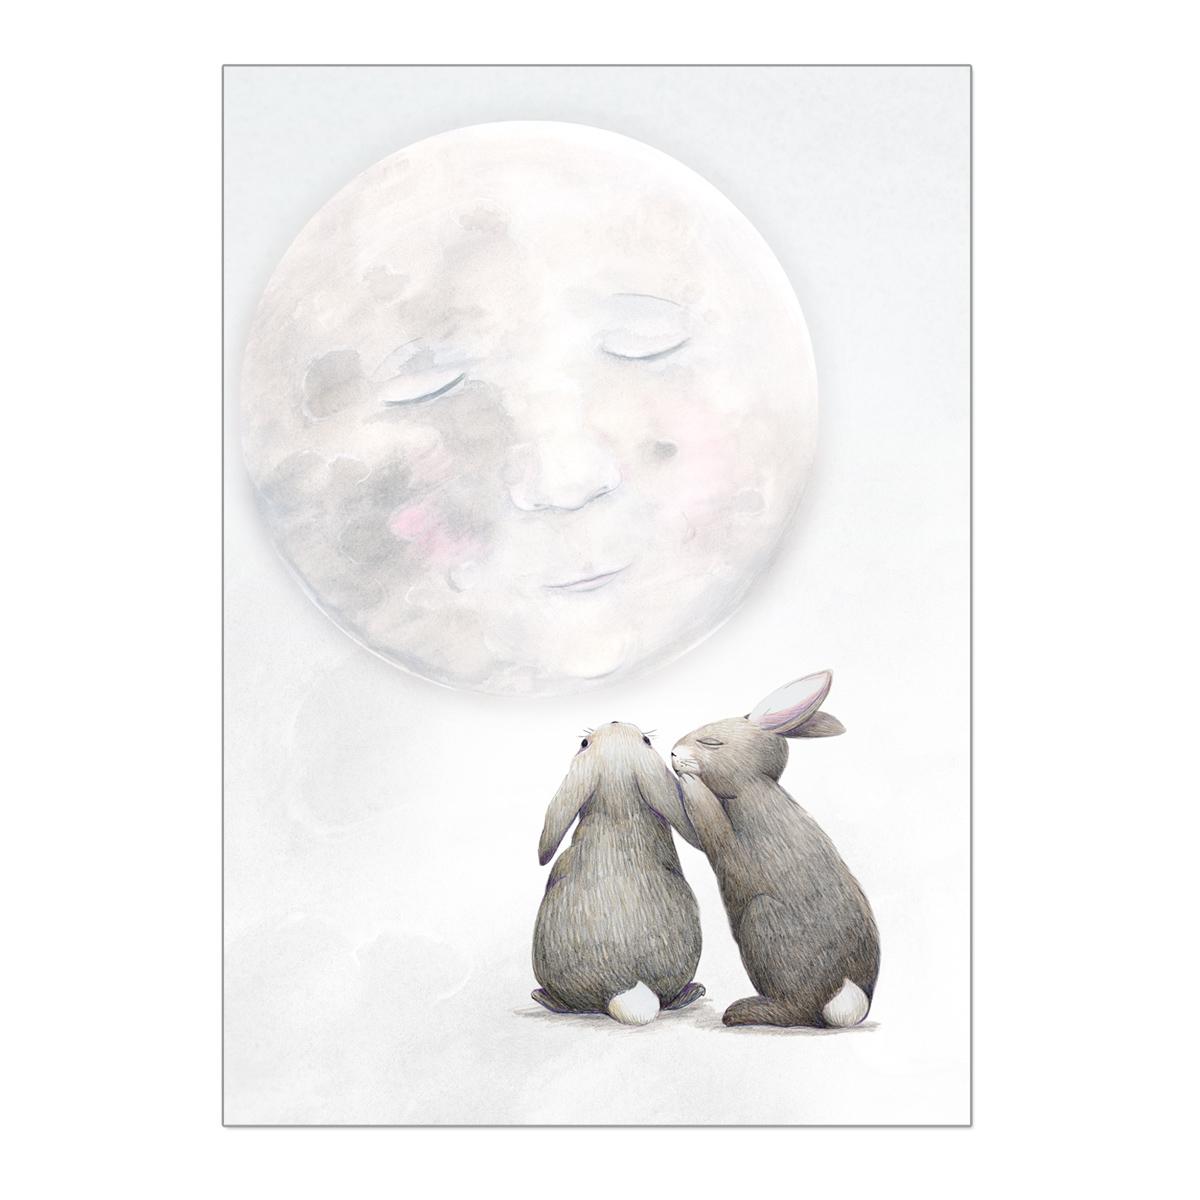 Moon Rabbits